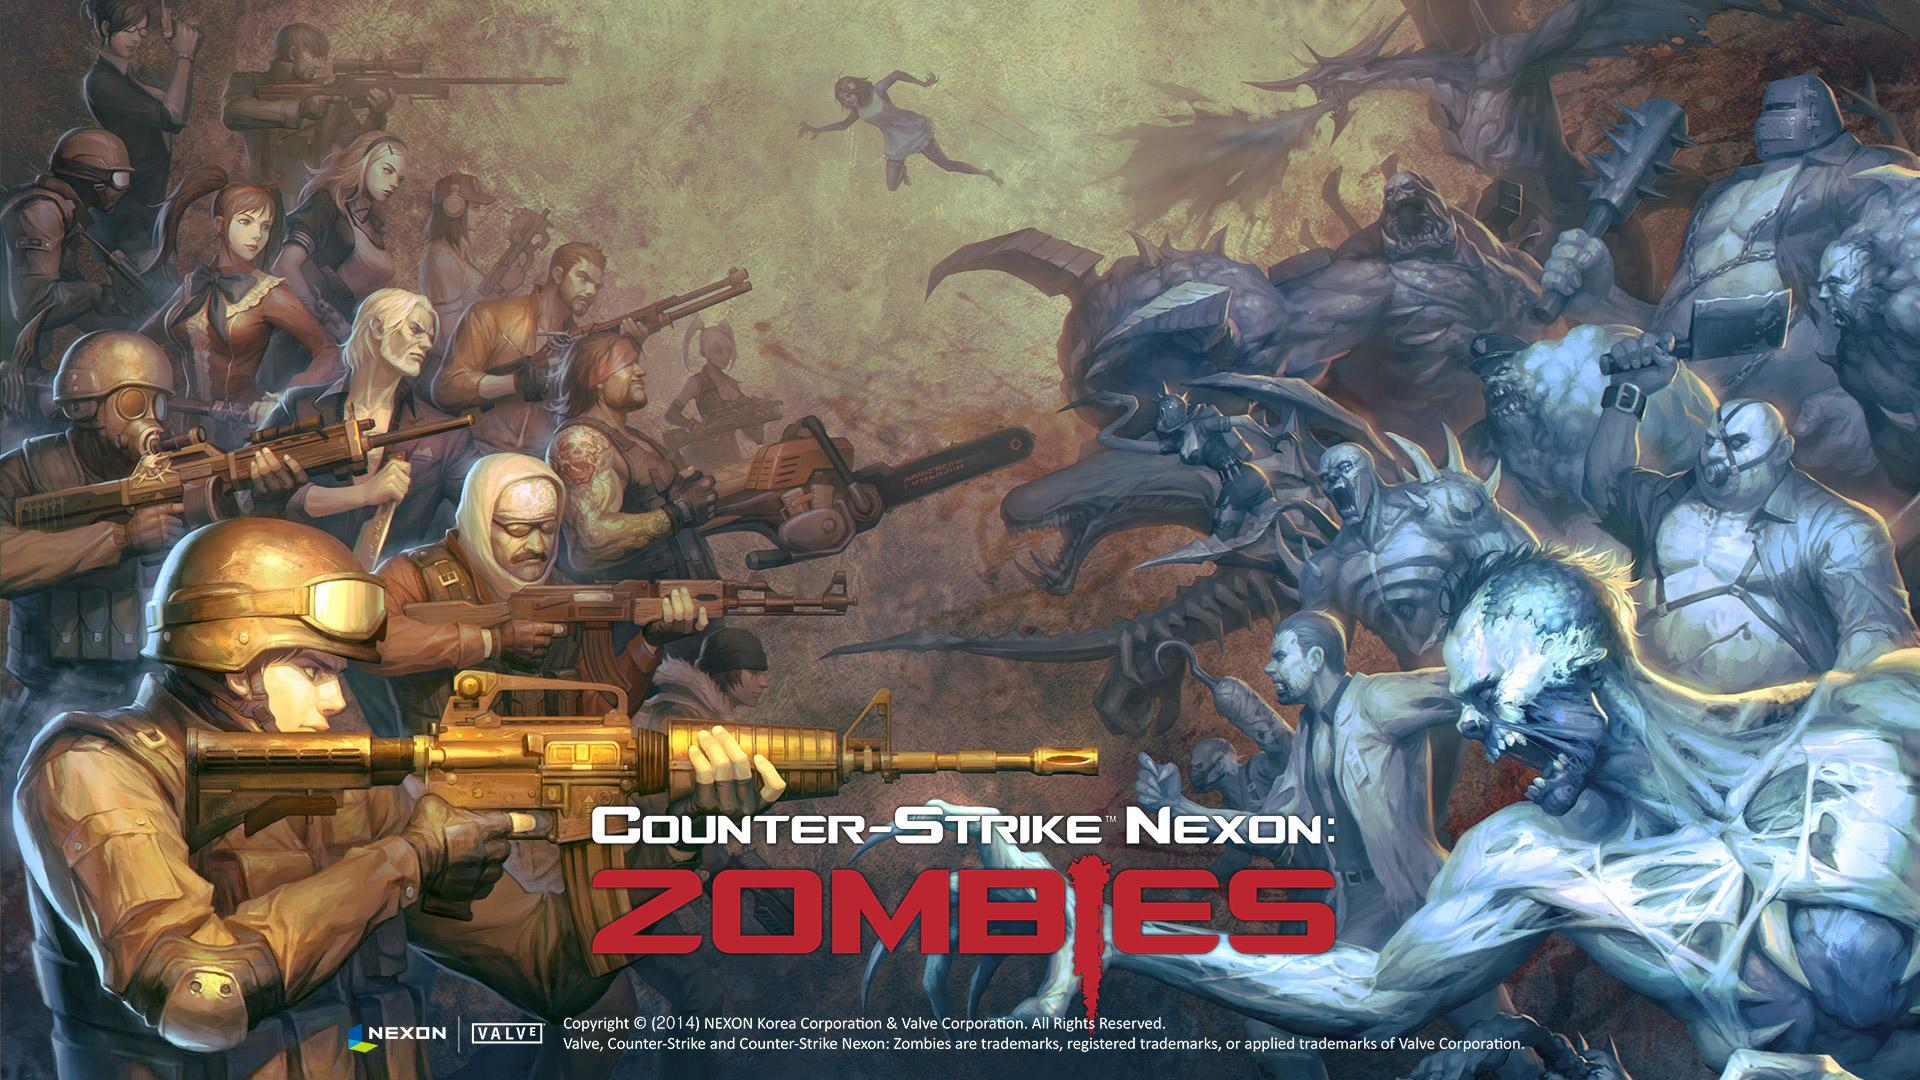 Free Counter-Strike Nexon: Zombies Wallpaper in 1920x1080